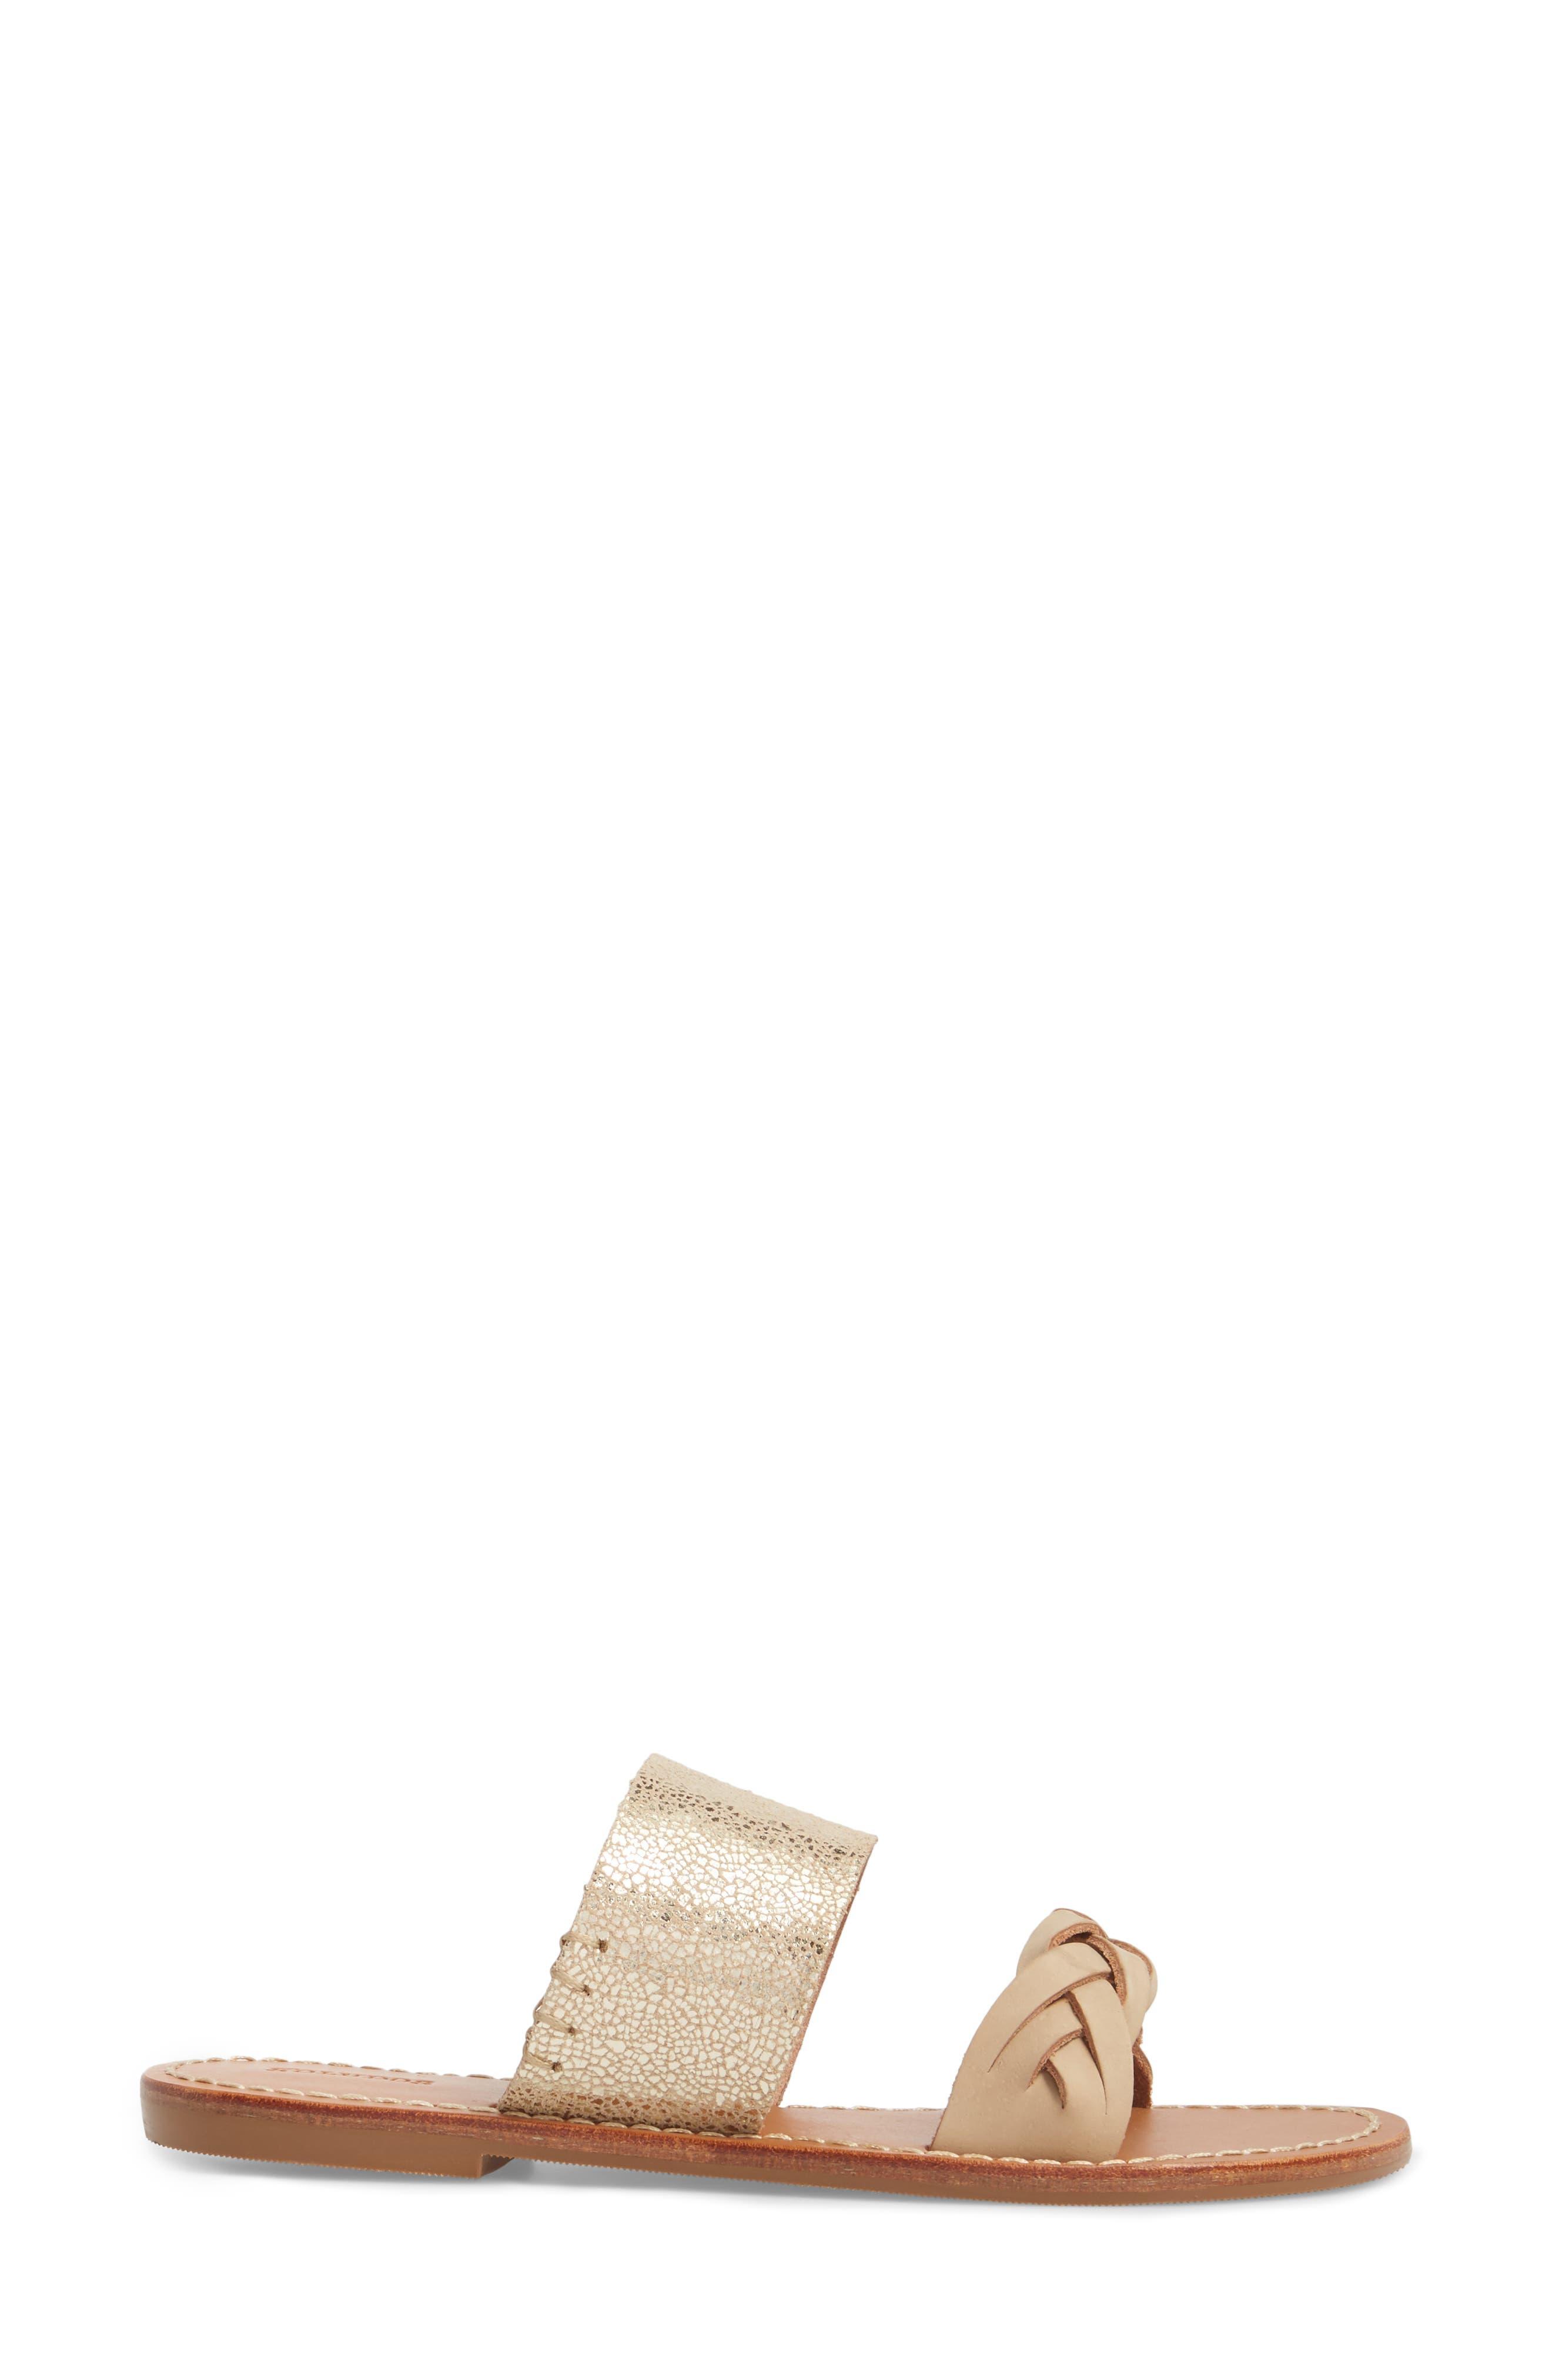 Slide Sandal,                             Alternate thumbnail 3, color,                             NUDE/ PALE GOLD LEATHER